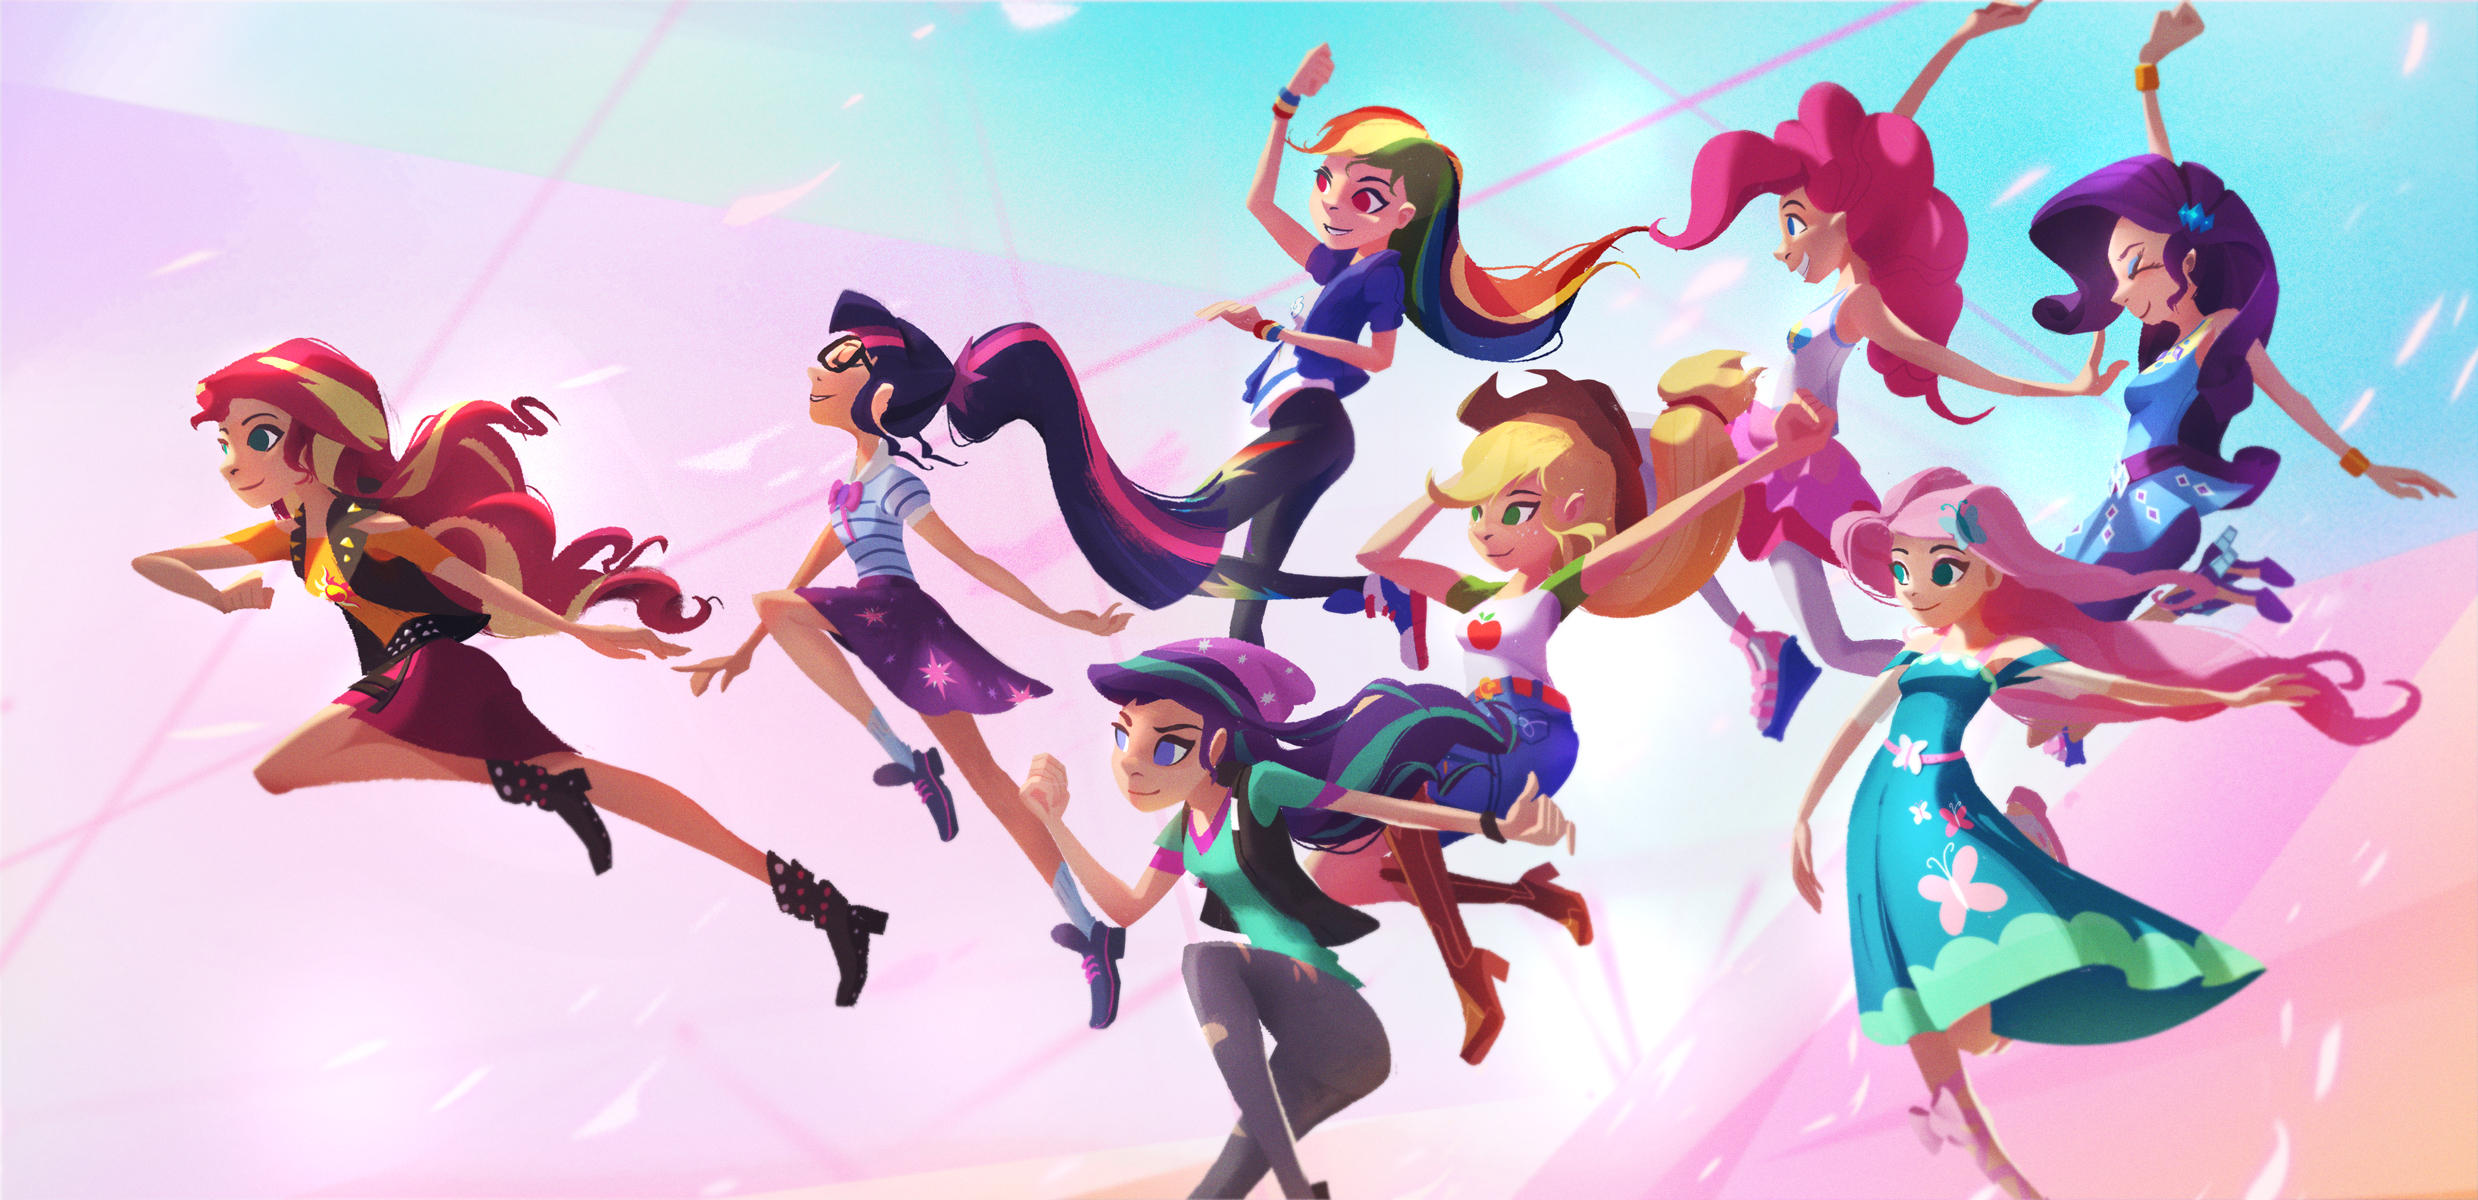 The Mane 8 - Equestria Girls by aJVL